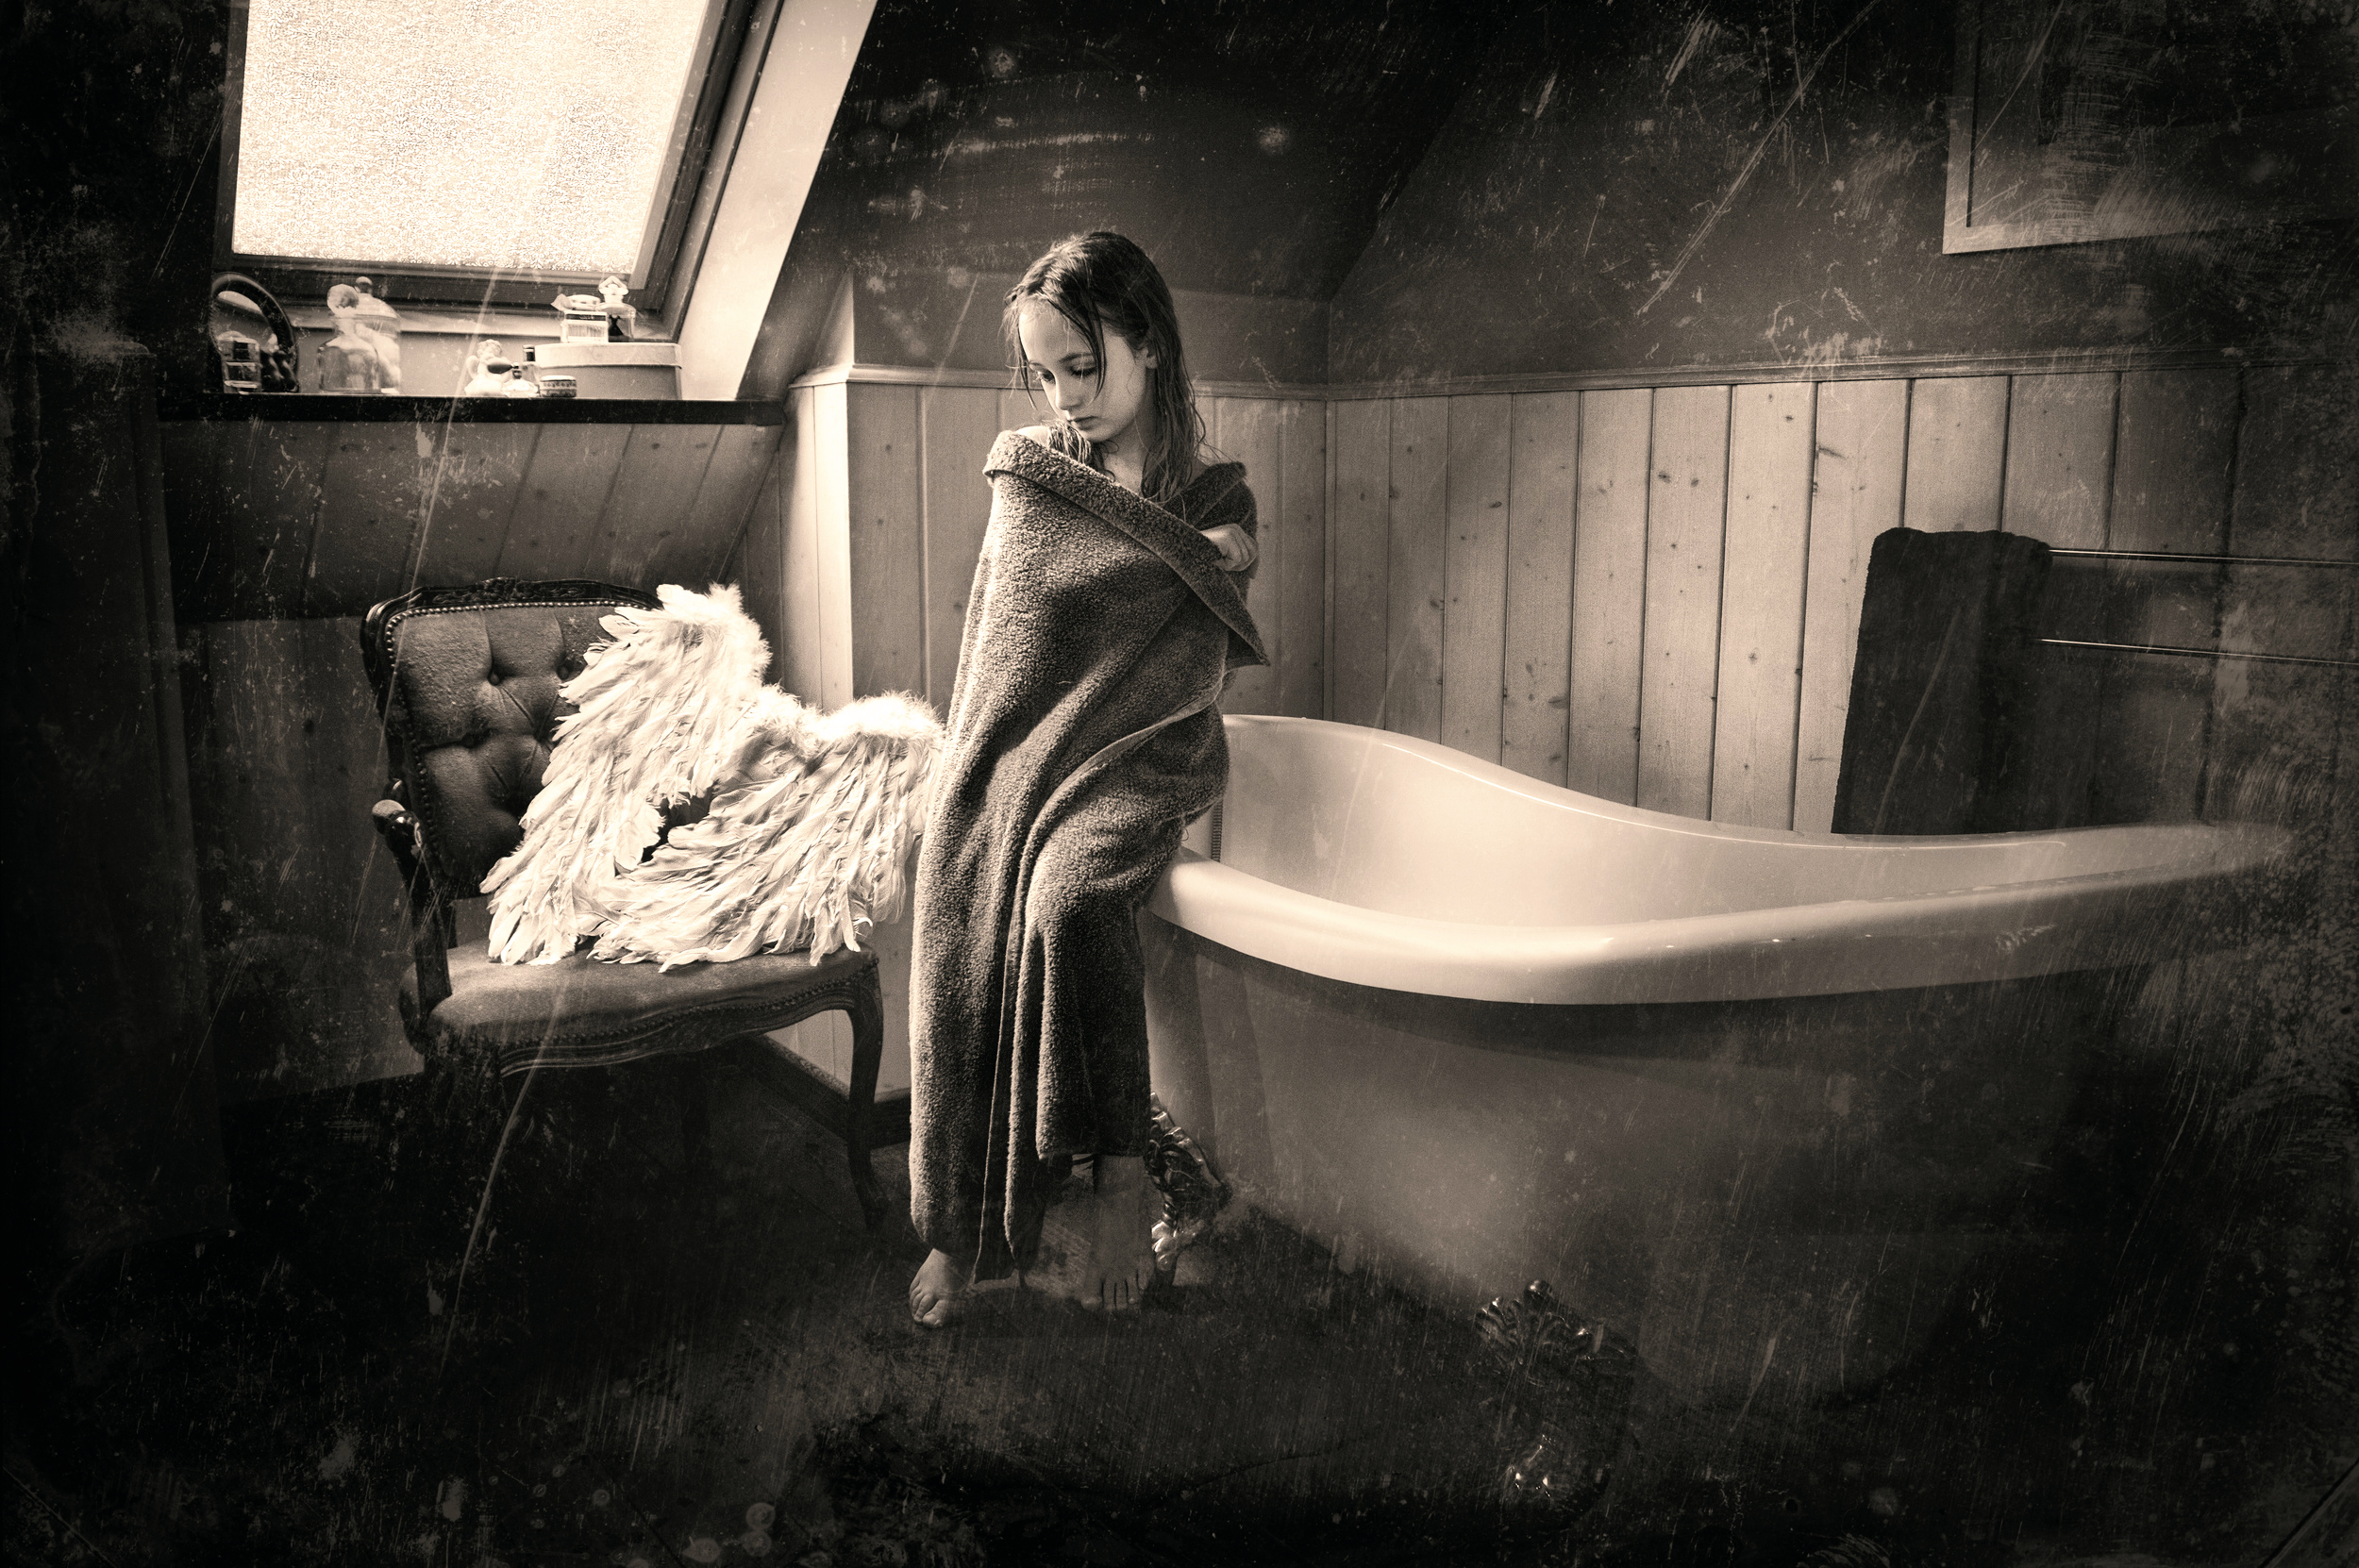 video-vintage-girl-bathroom-naked-women-water-polo